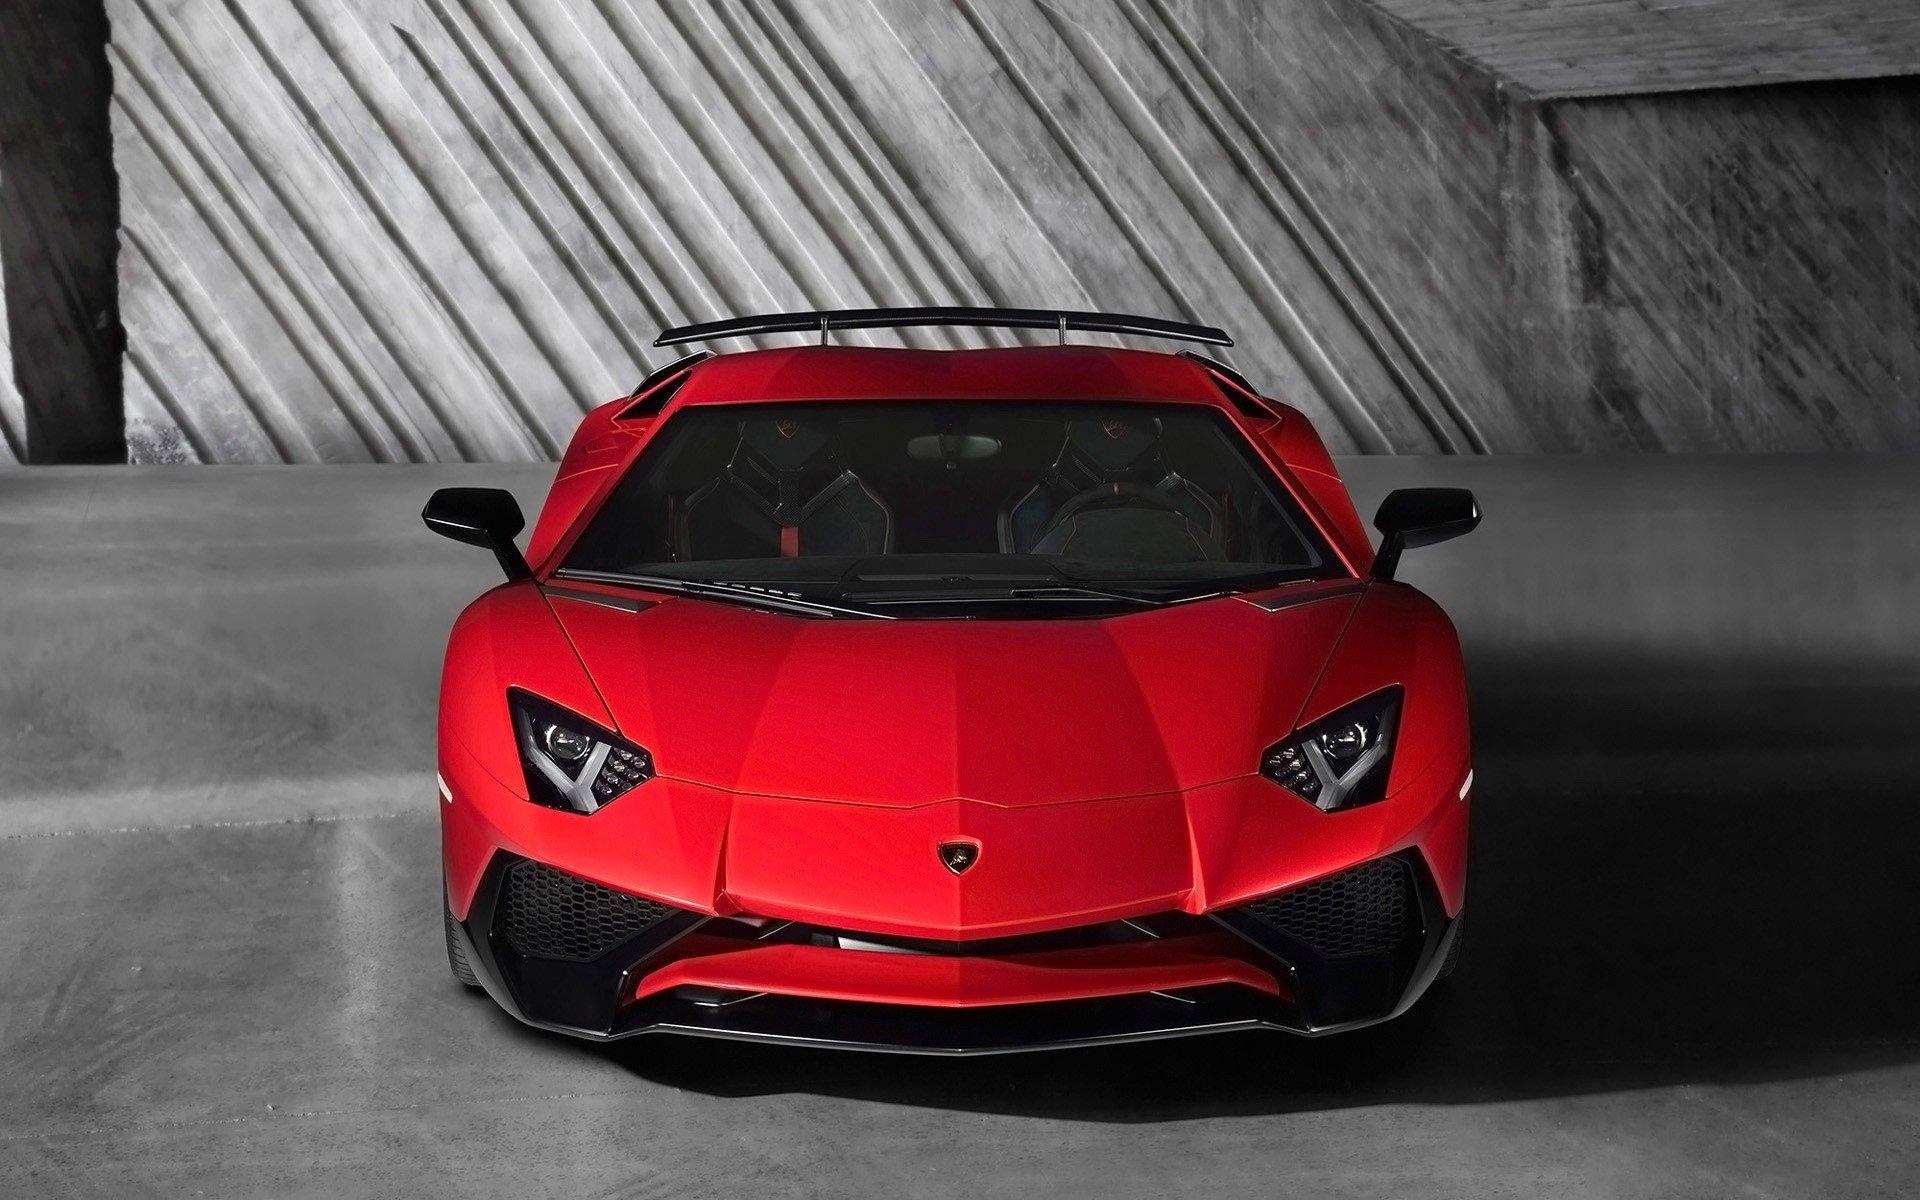 Fondos de pantalla Lamborghini Aventador LP750 4 superveloce